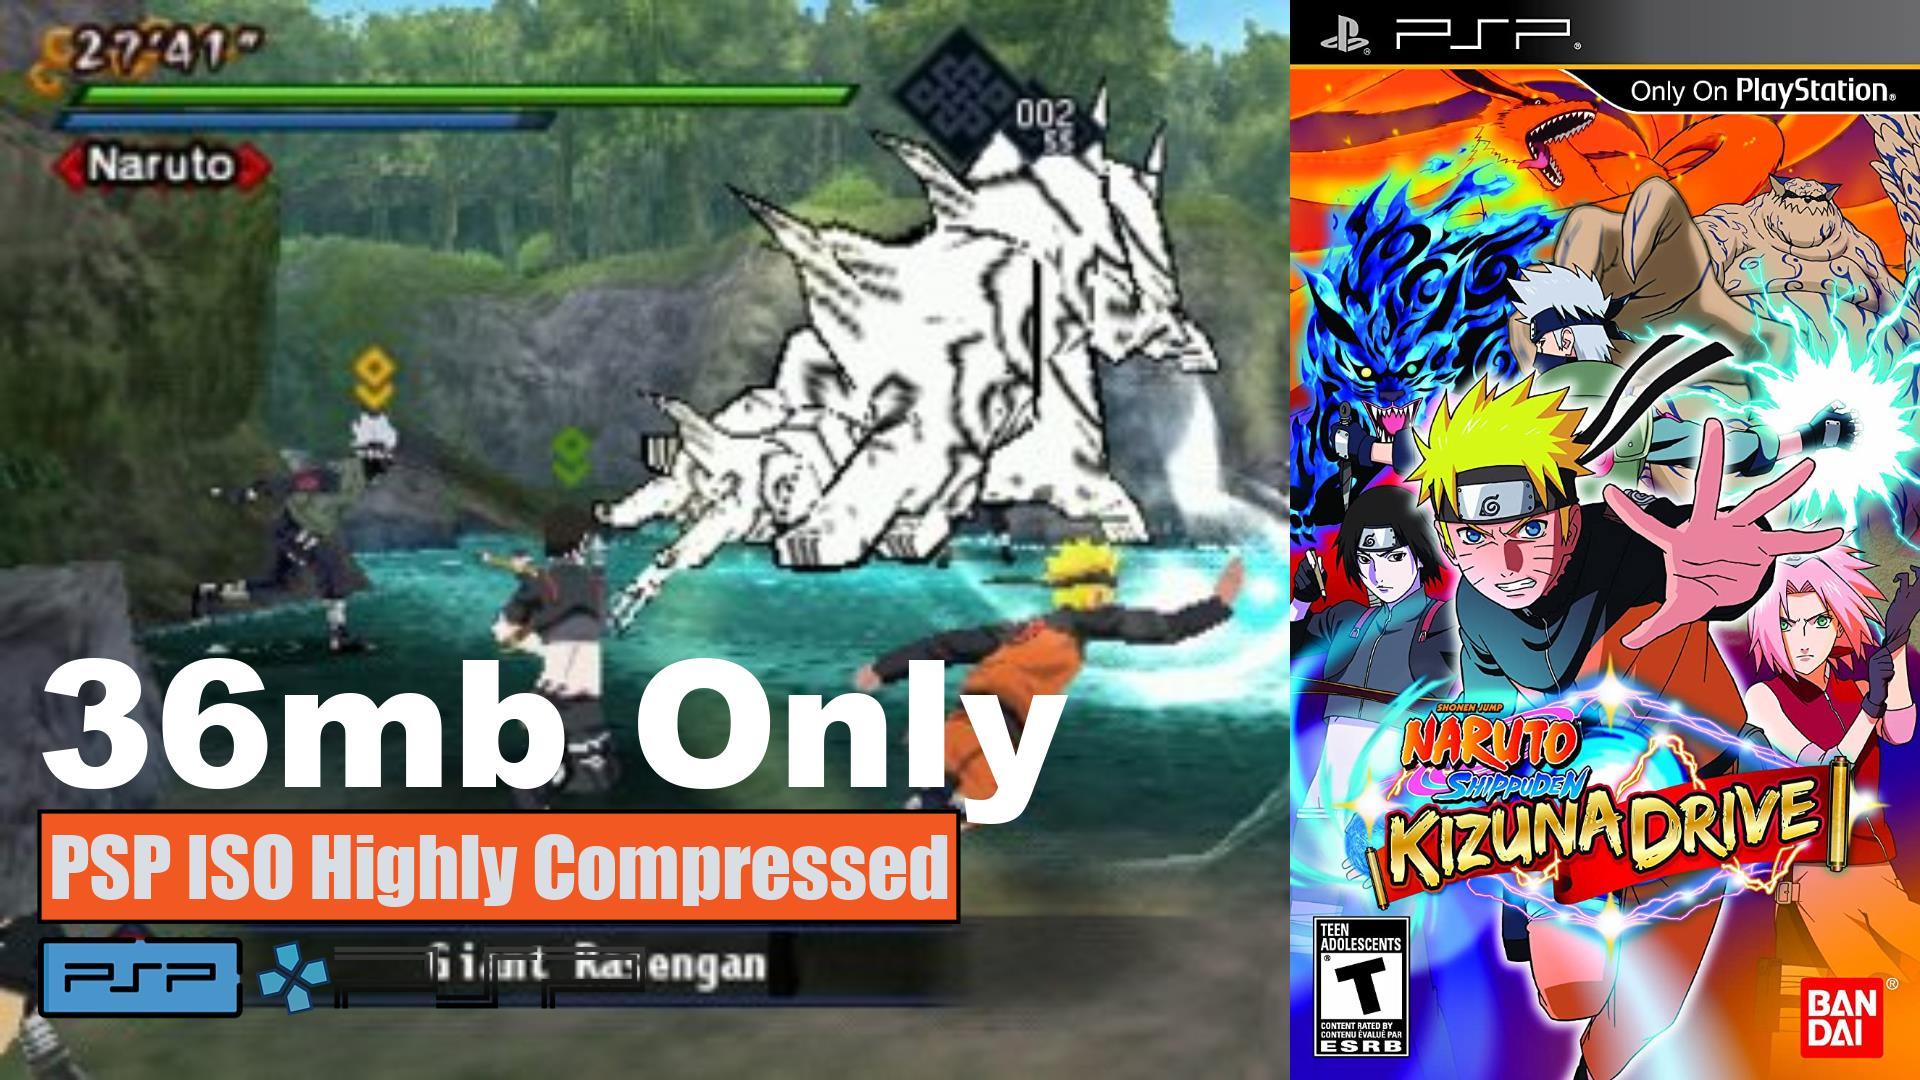 Naruto Shippuden Kizuna Drive PSP ISO Highly Compressed - SafeROMs